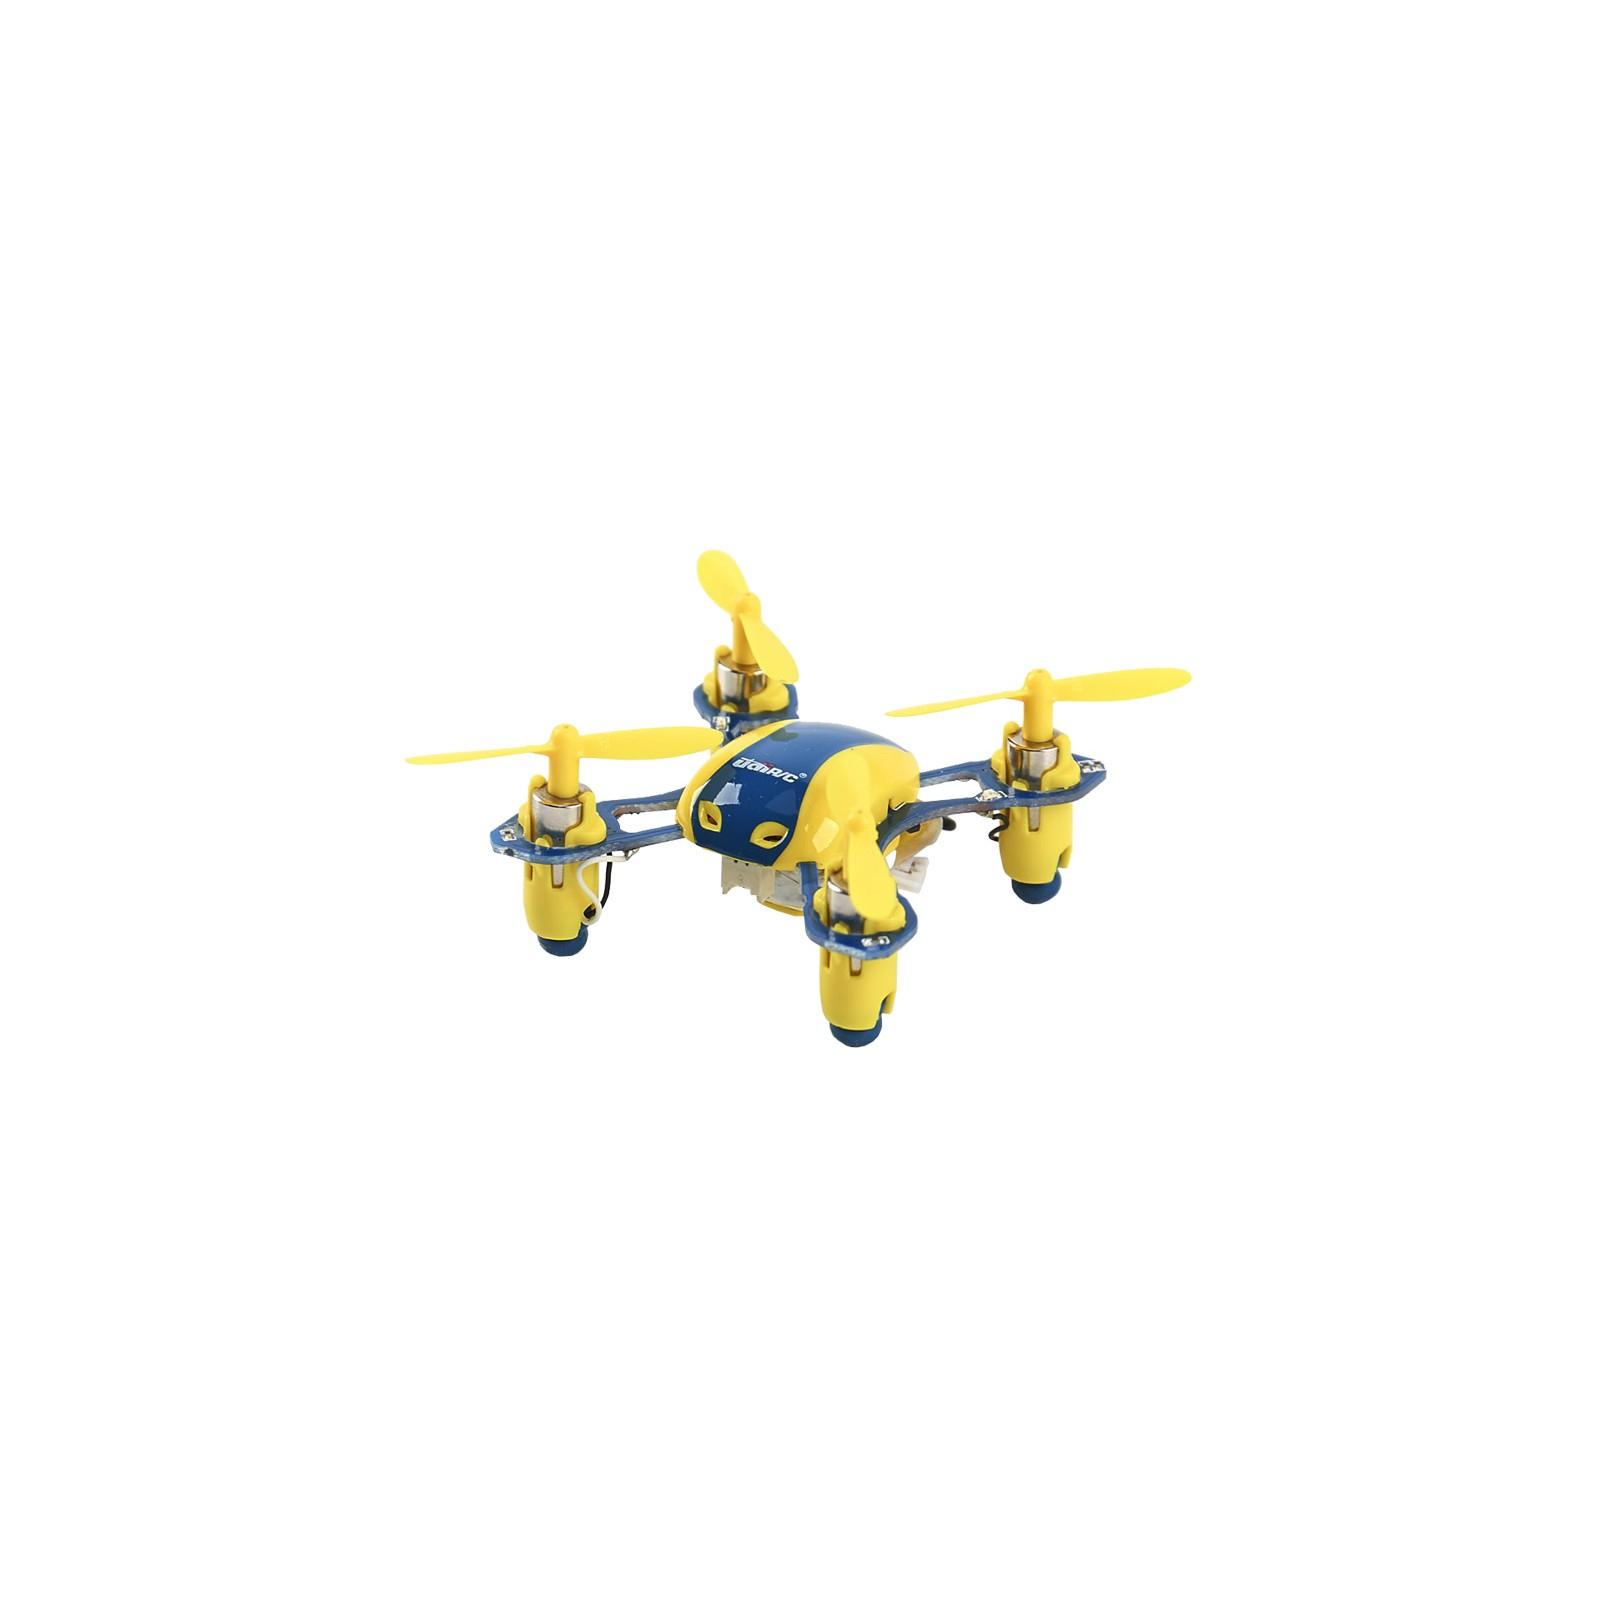 Квадрокоптер UDIRC 2,4 GHz 40 мм мини 3.7V (U840 Yellow/Blue) изображение 2